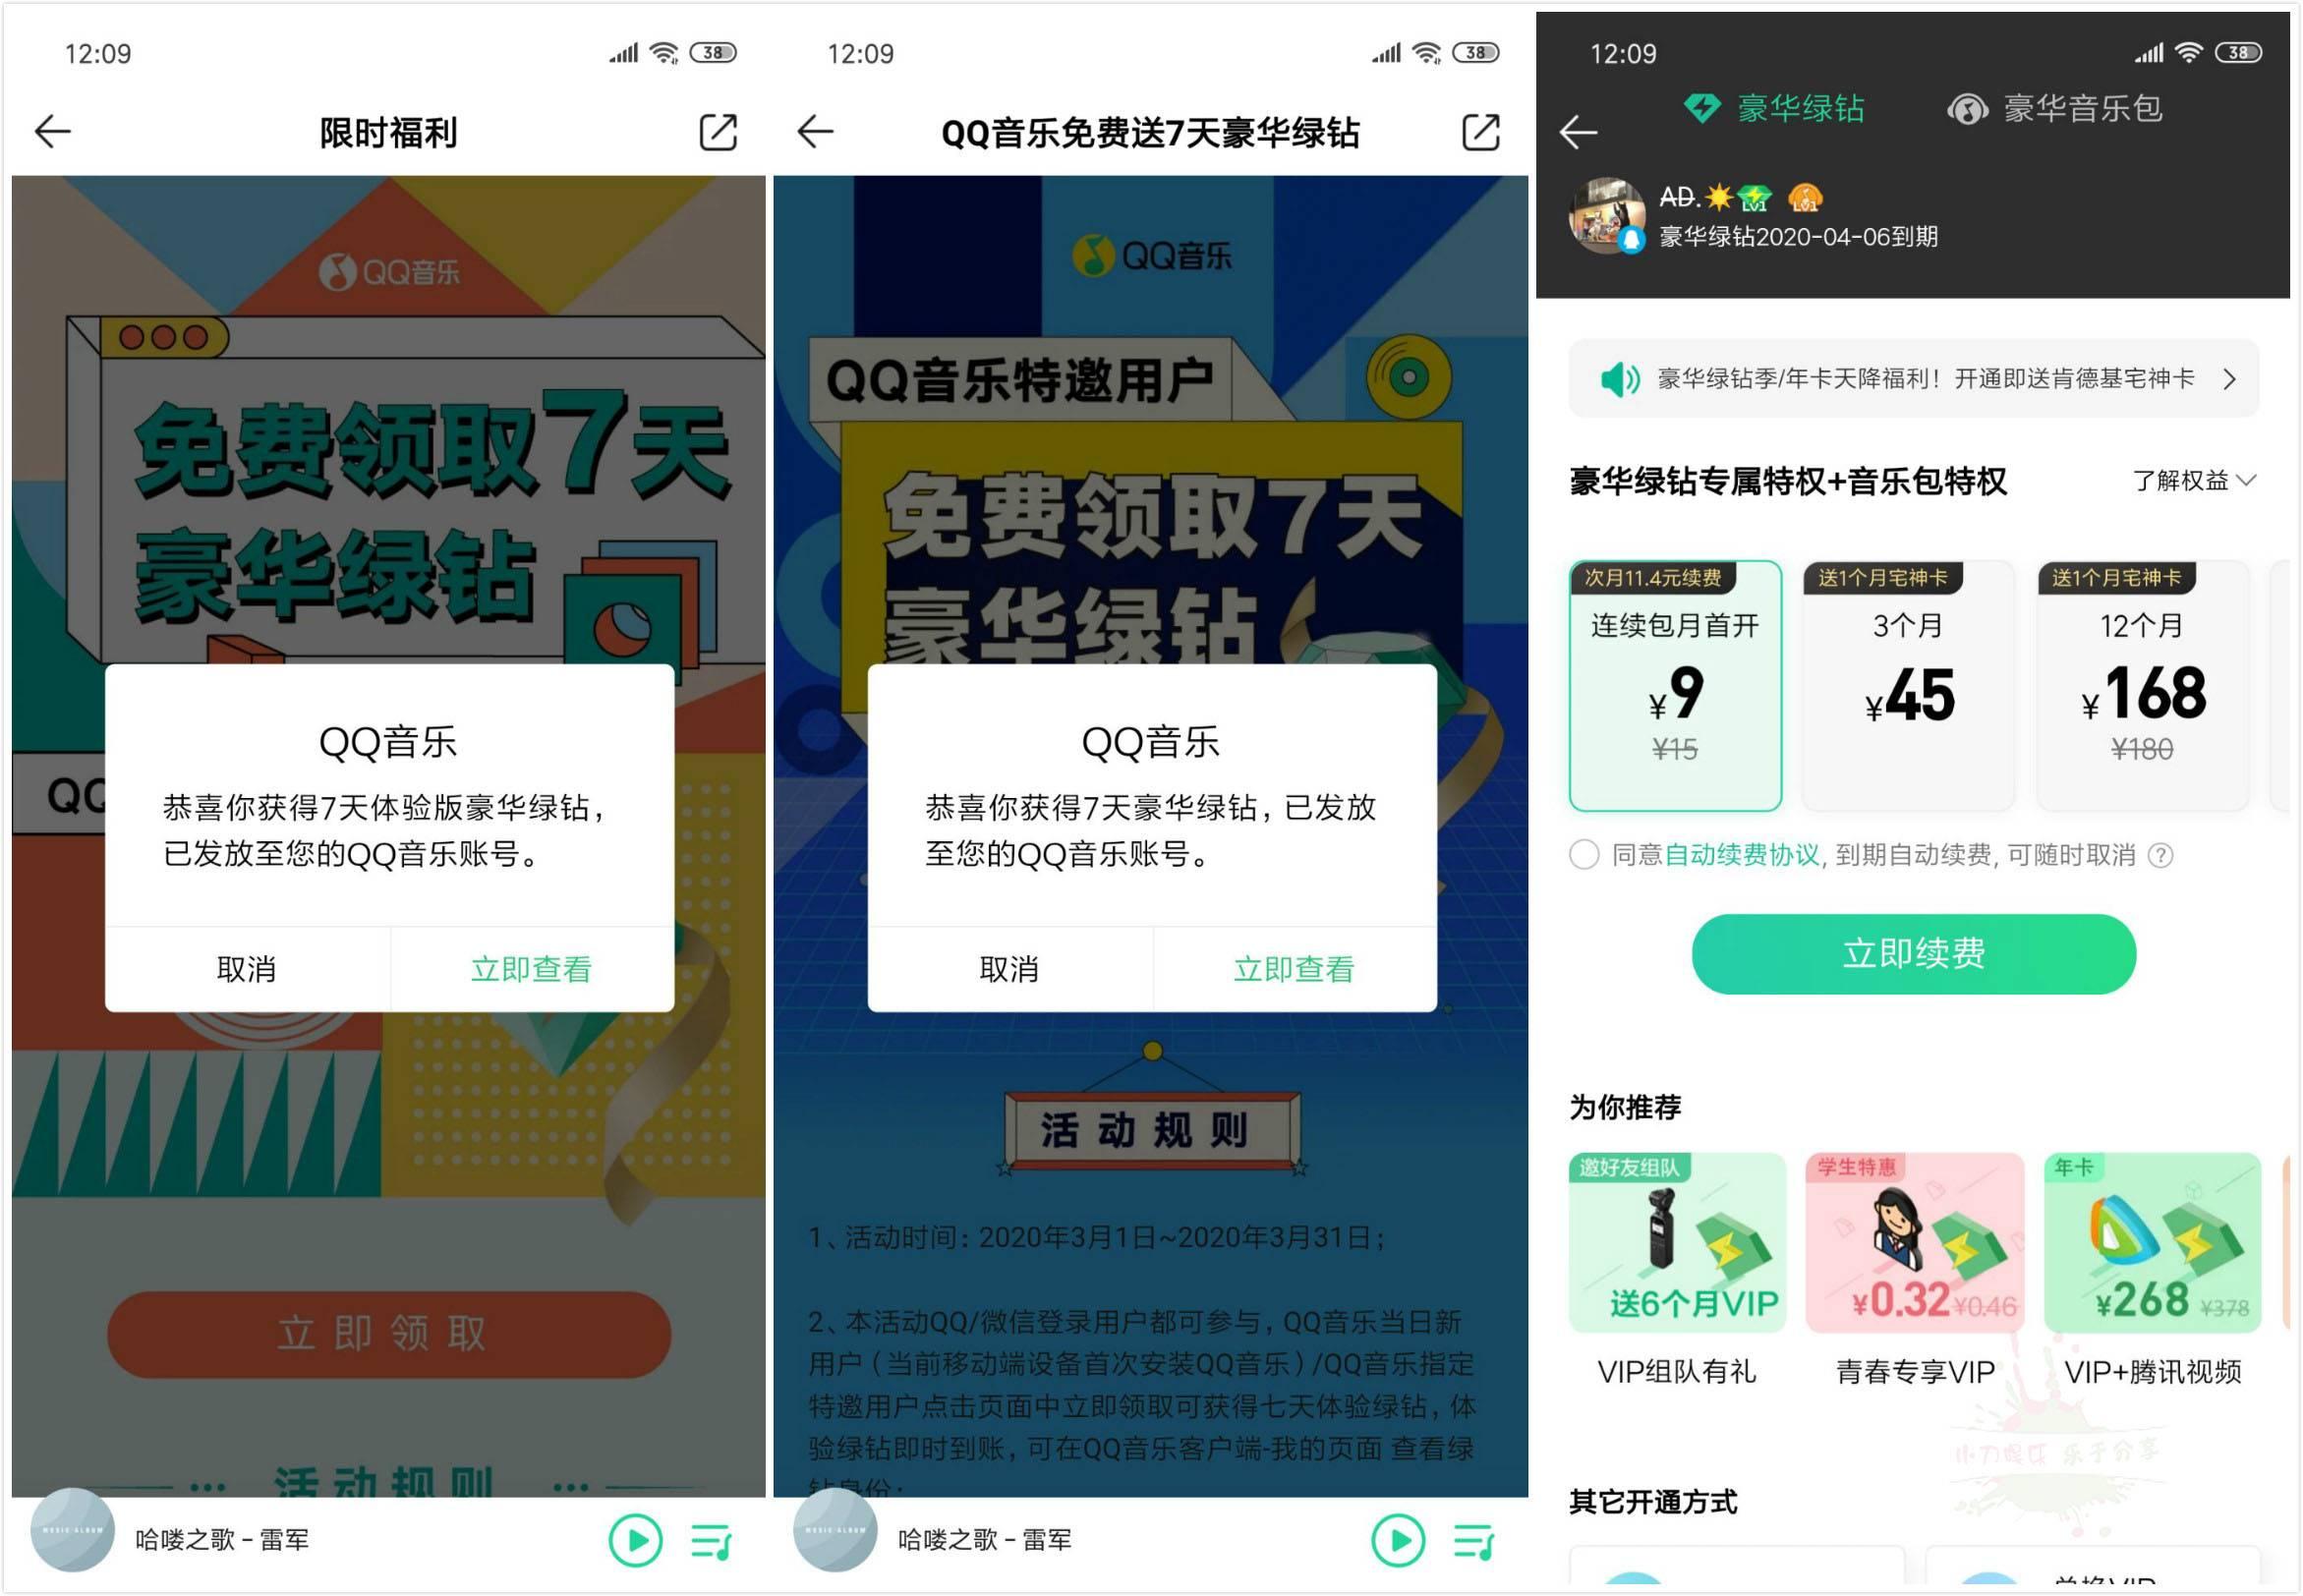 QQ音乐小号领取14天豪华绿钻